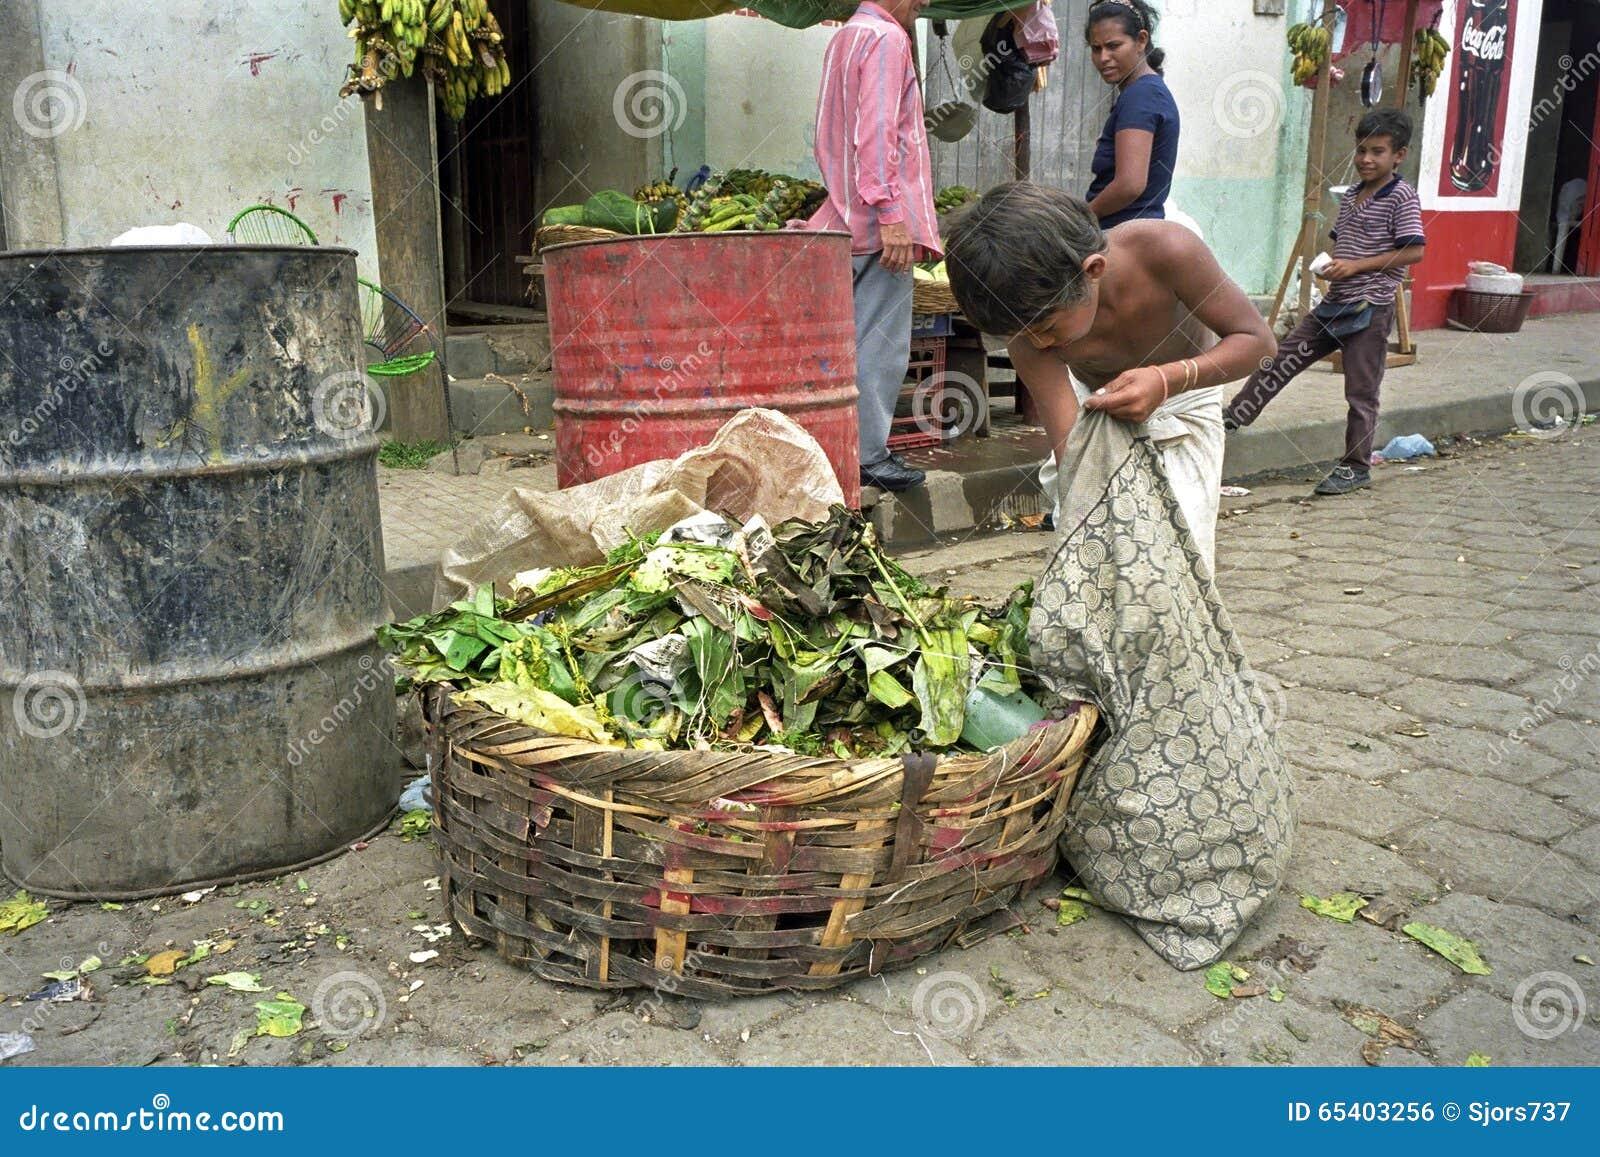 Poor Latino Boy gets food from waste bin, Nicaragua